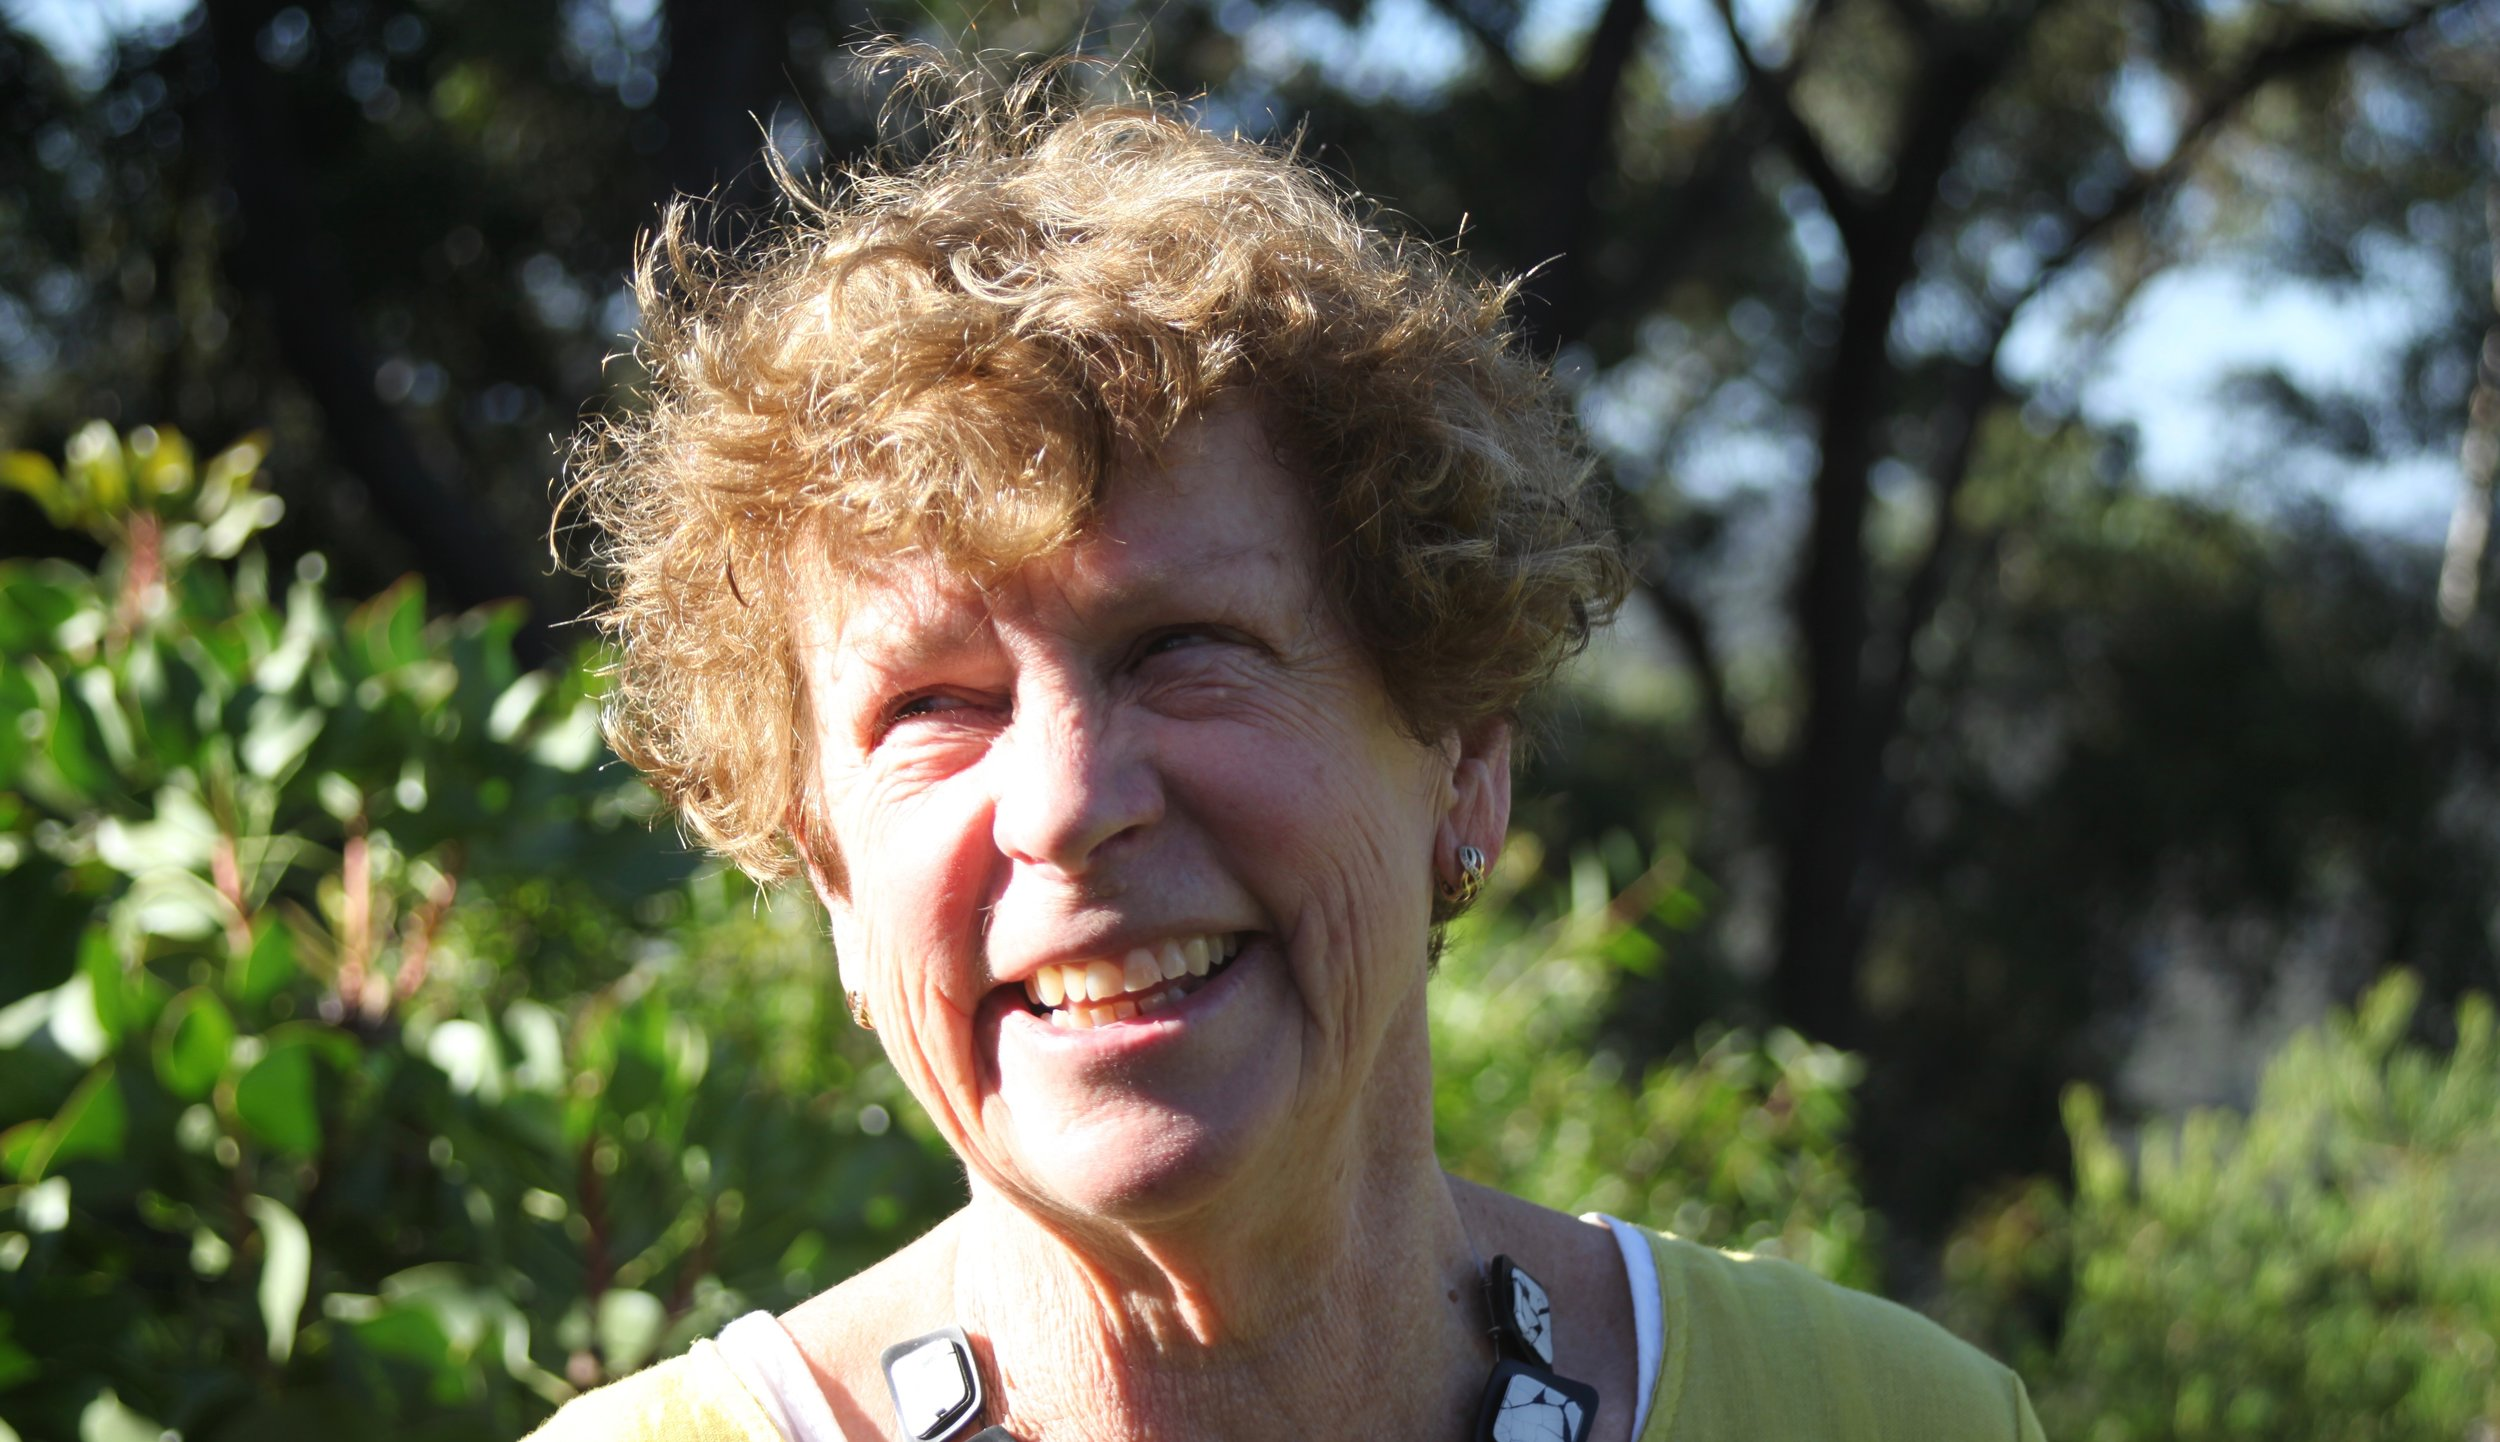 Susanne Rix, Founder of the Edible Garden Trail